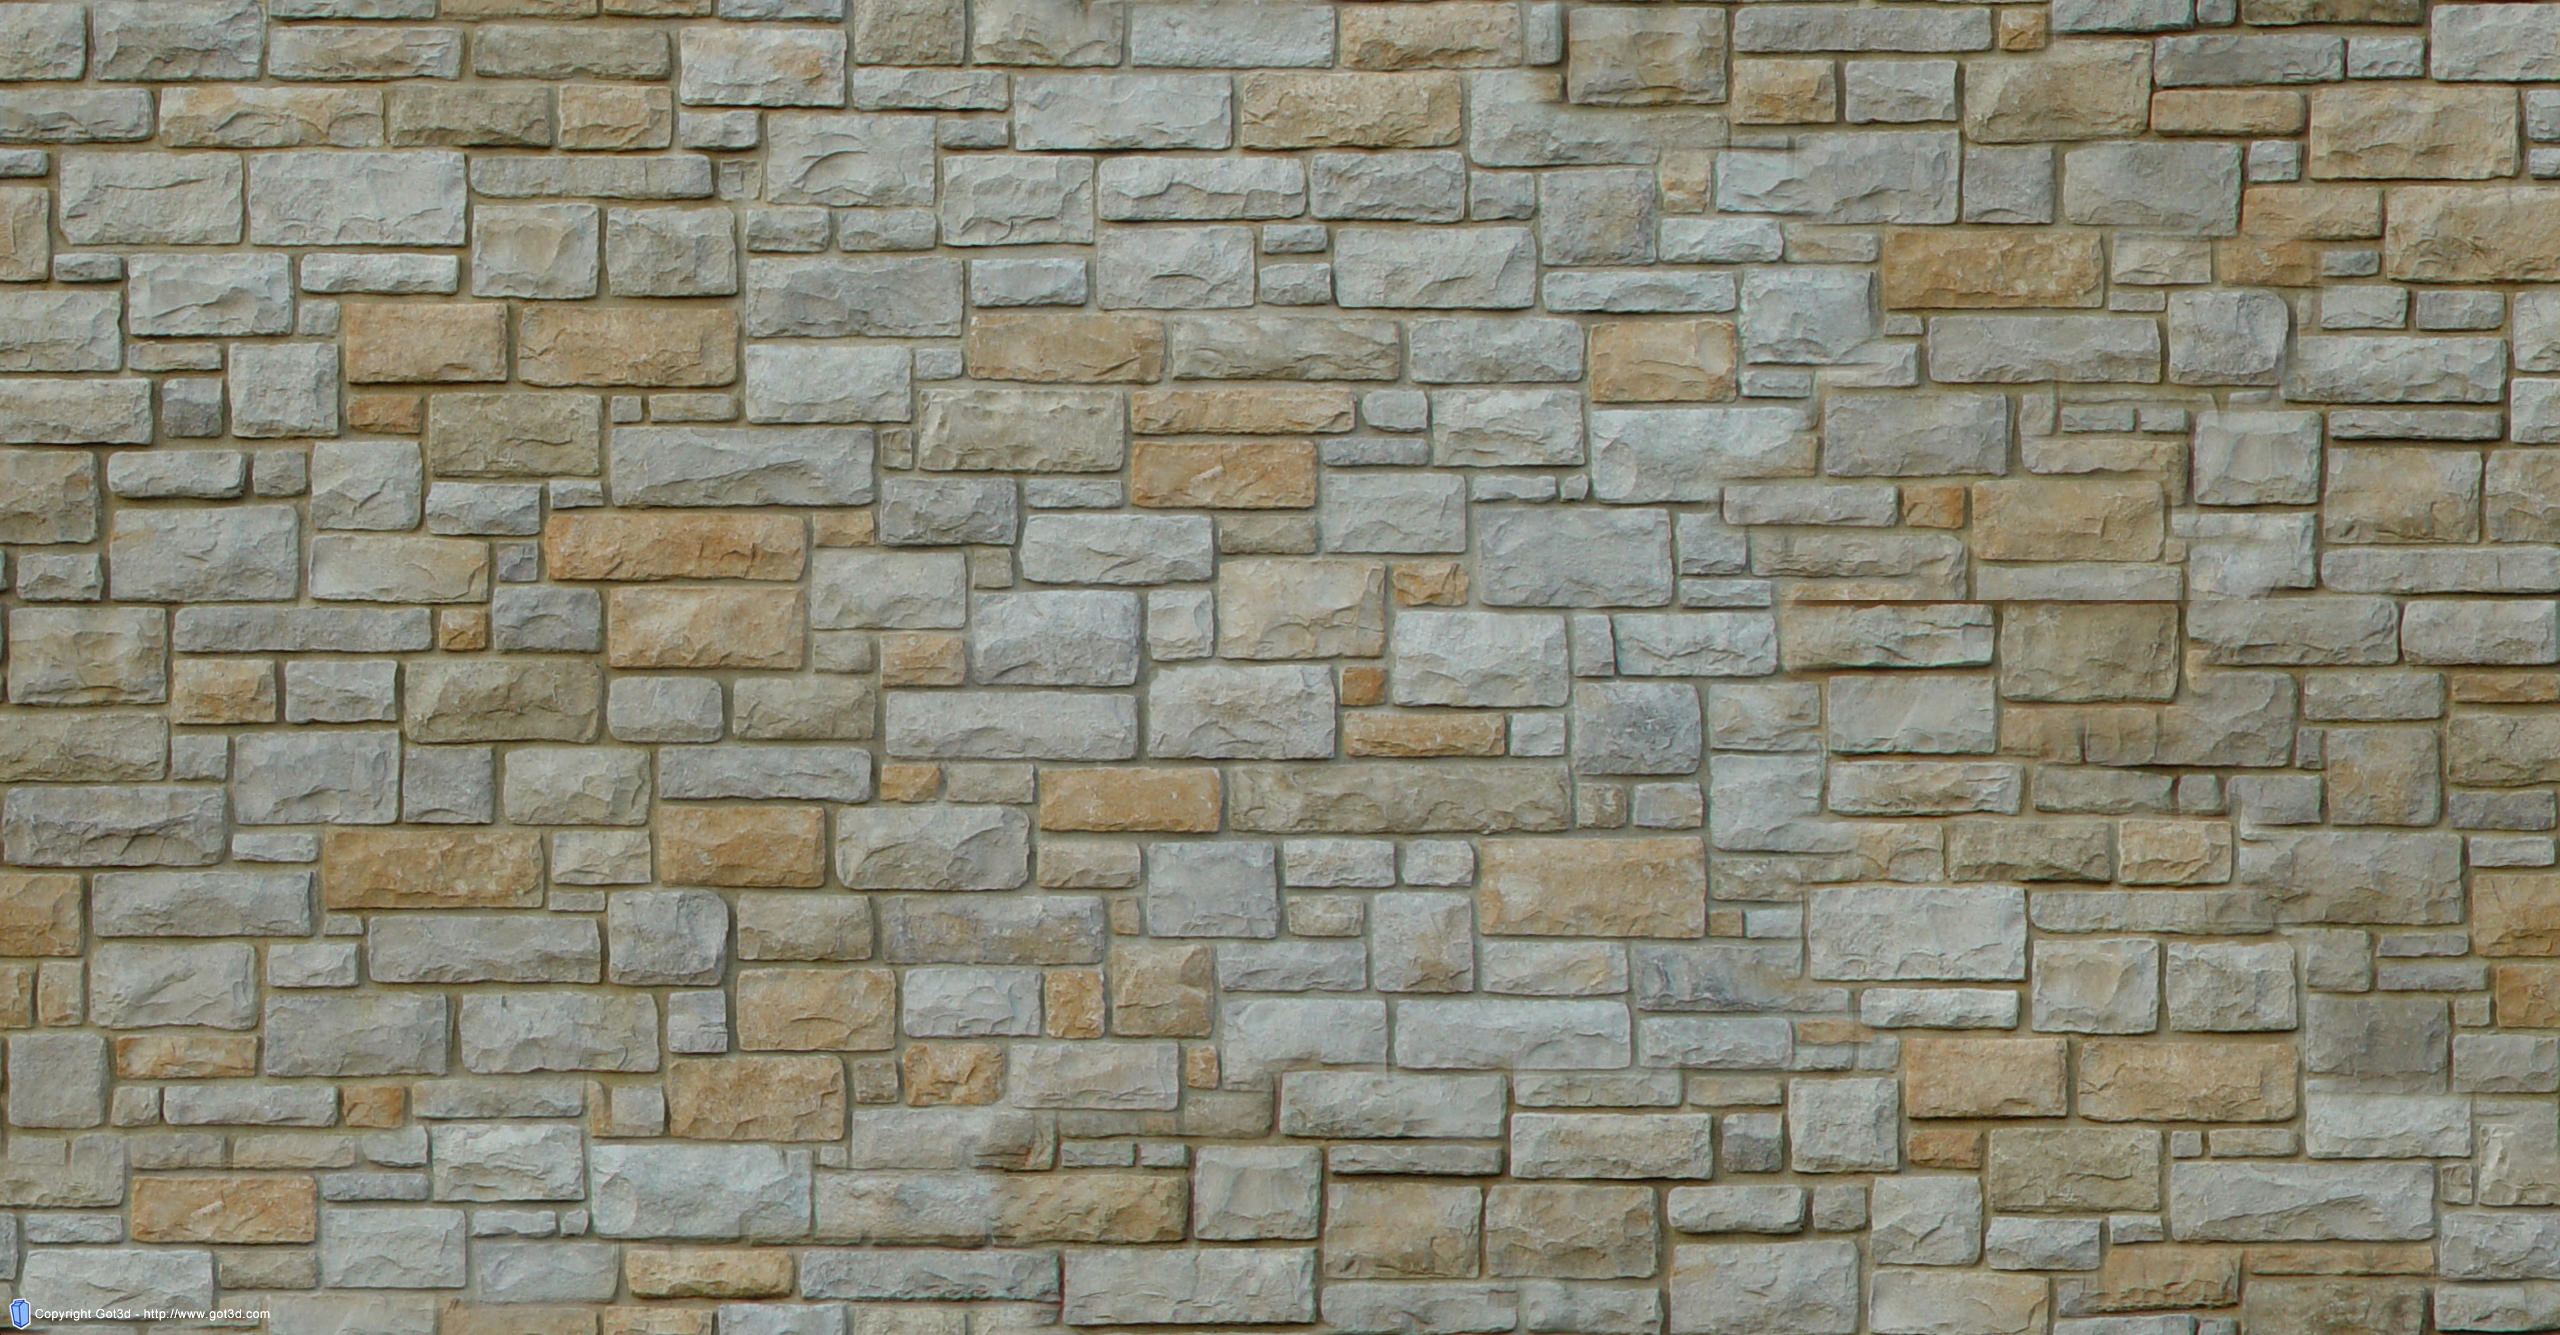 fantastic stone image